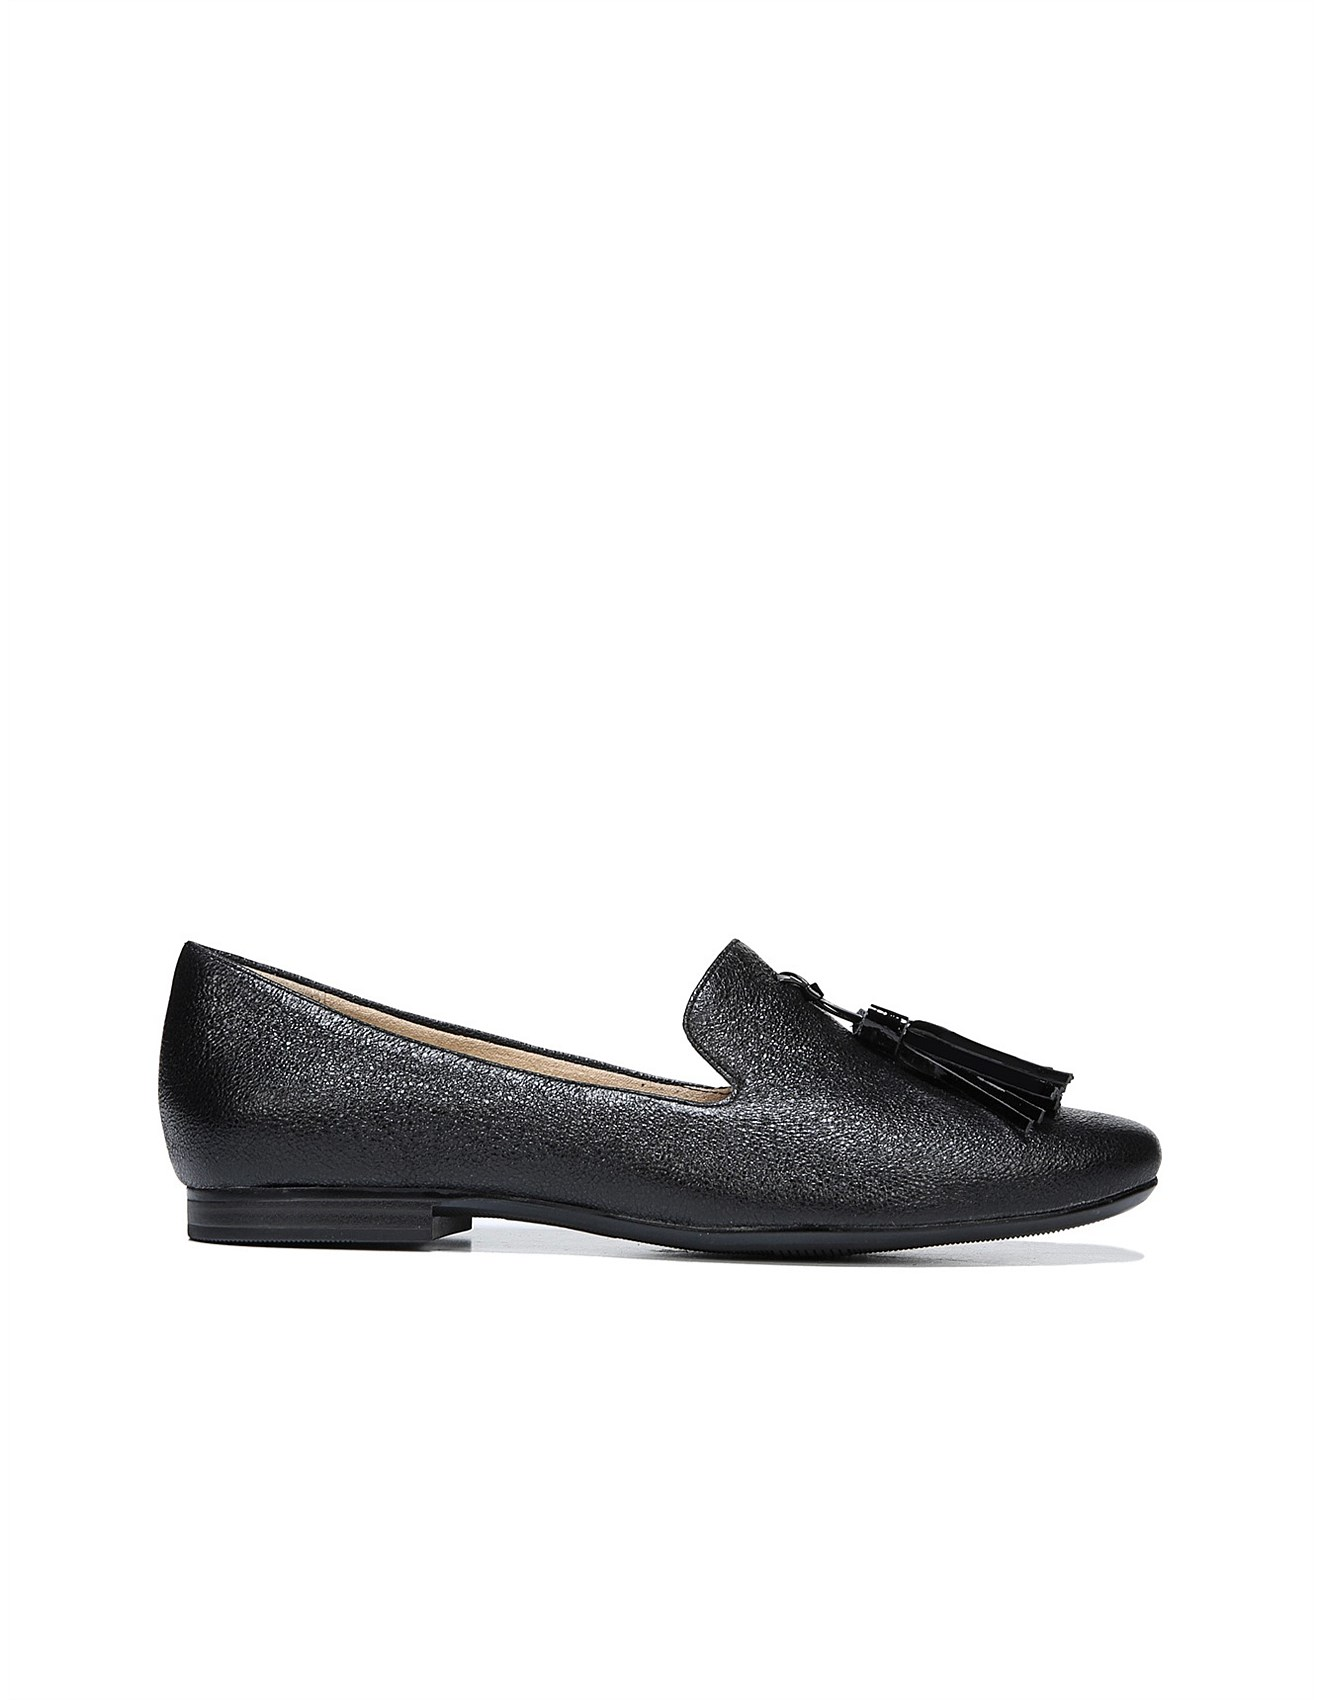 c8613c8f15d Women s Flat Shoes